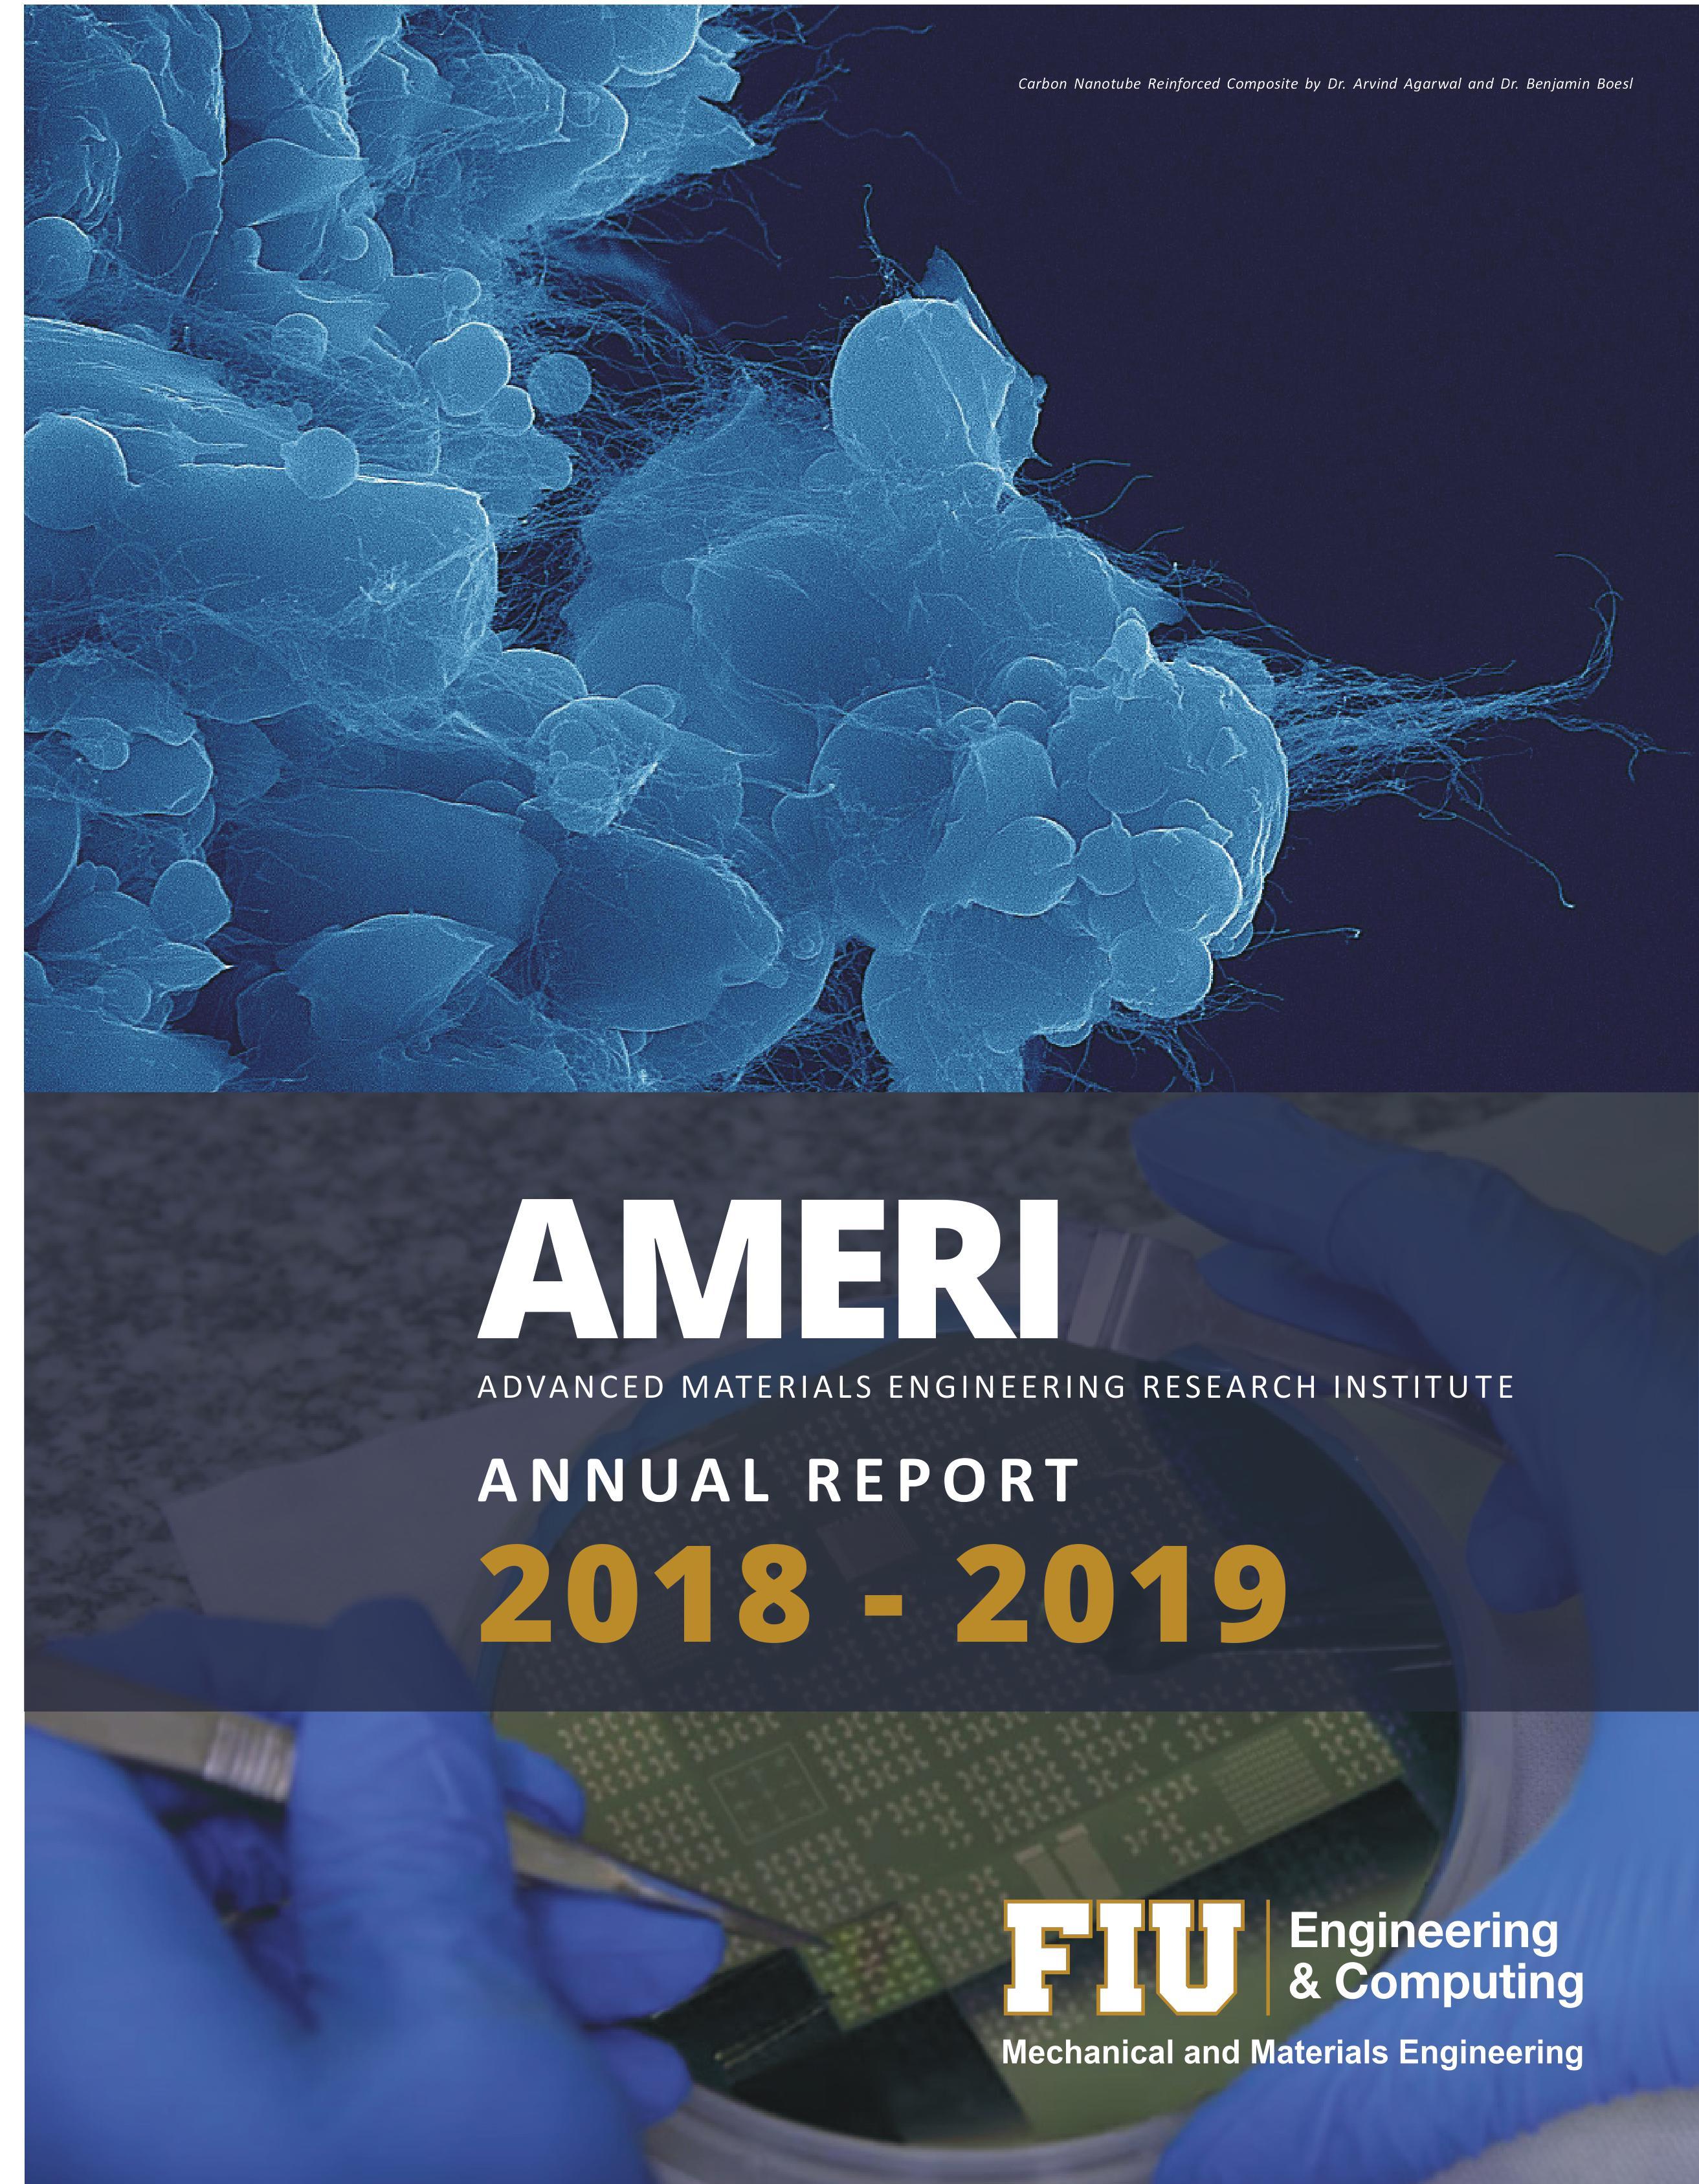 AMERI_19_ANNUAL_REPORT